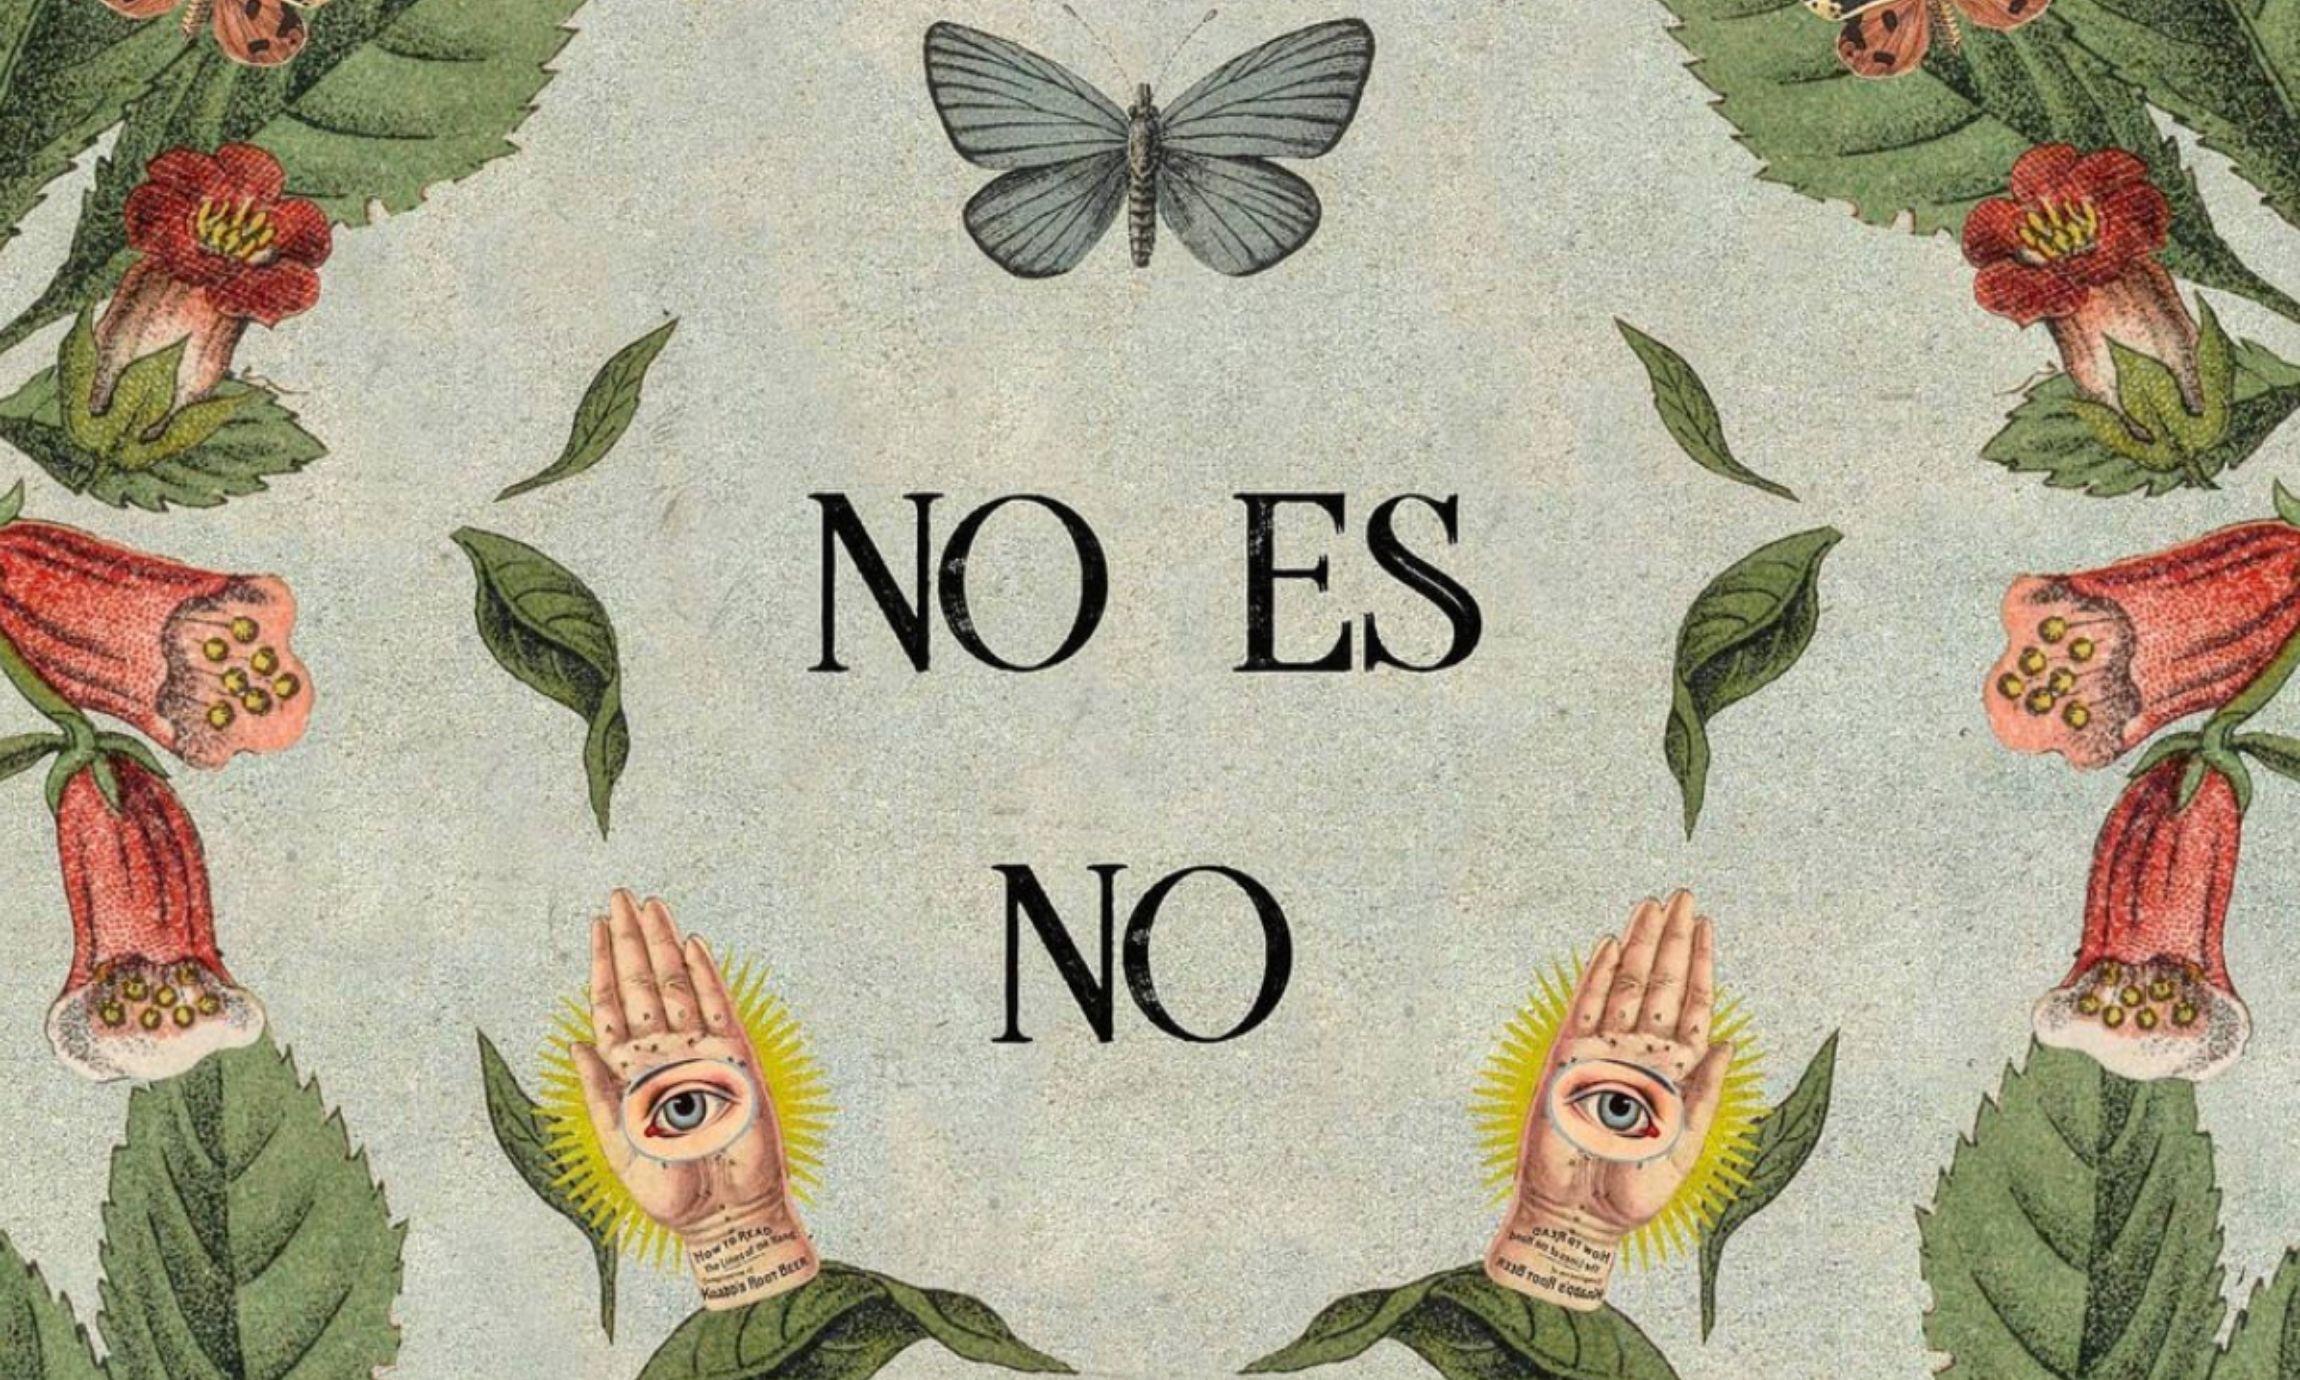 Discover Miranda Guerrero's Feminist and Magical Illustrations